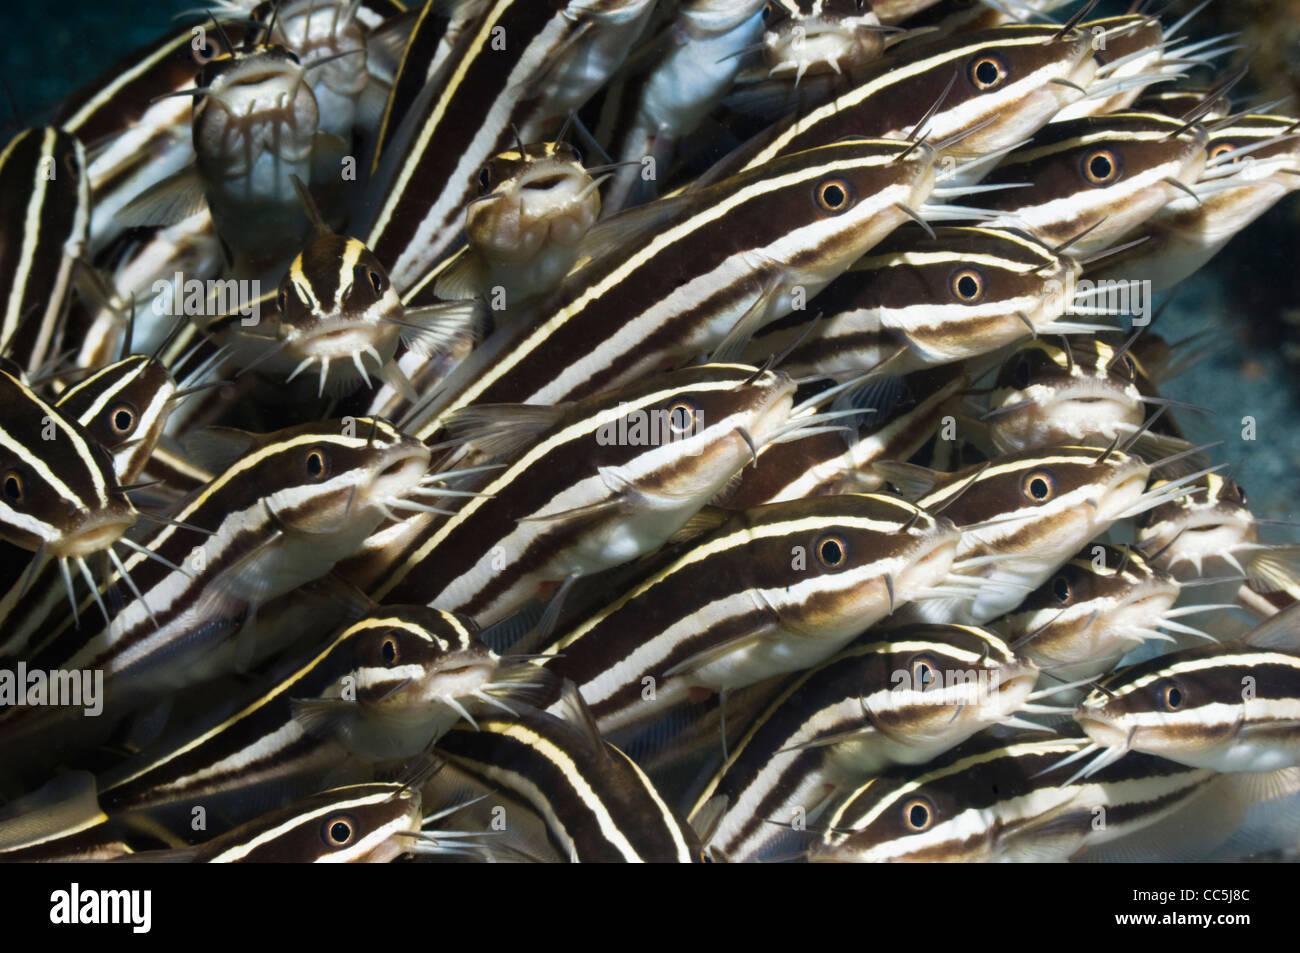 Striped catfish (Plutosus lineatus) school. Manado, Sulawesi, Indonesia. Stock Photo